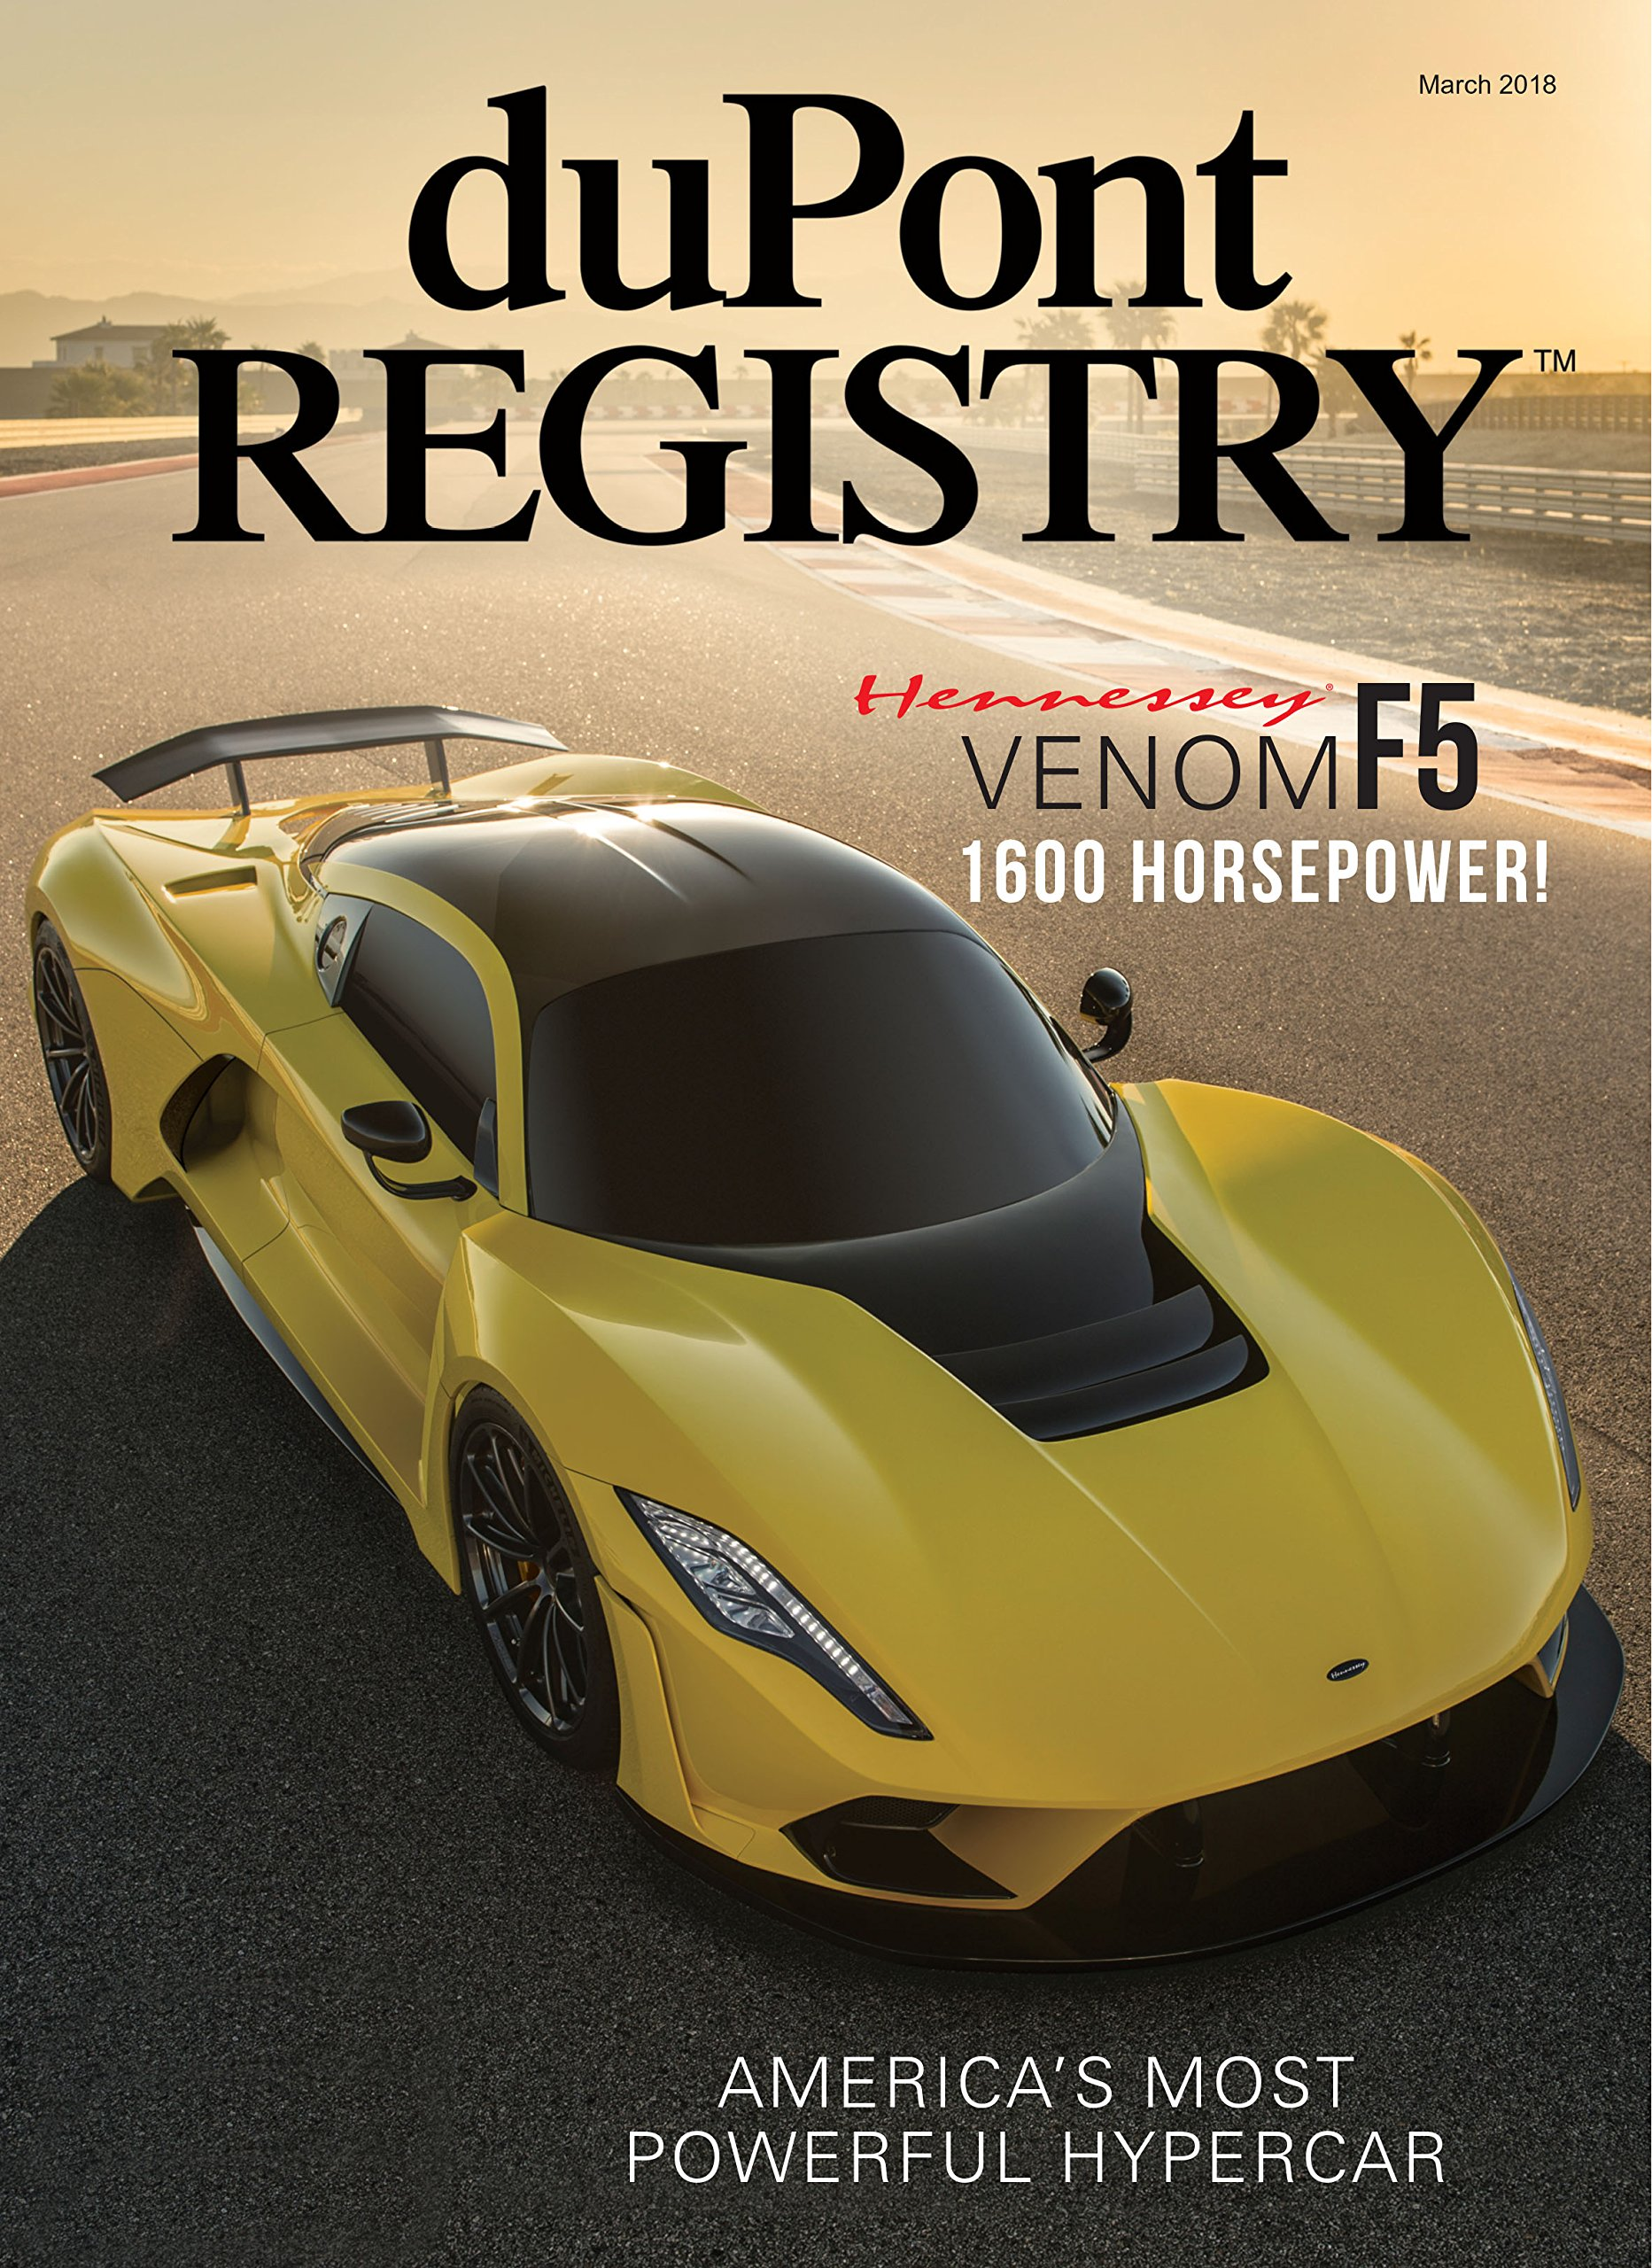 Dupont Registry Autos March 2018 Dupont Registry Amazon Com Books